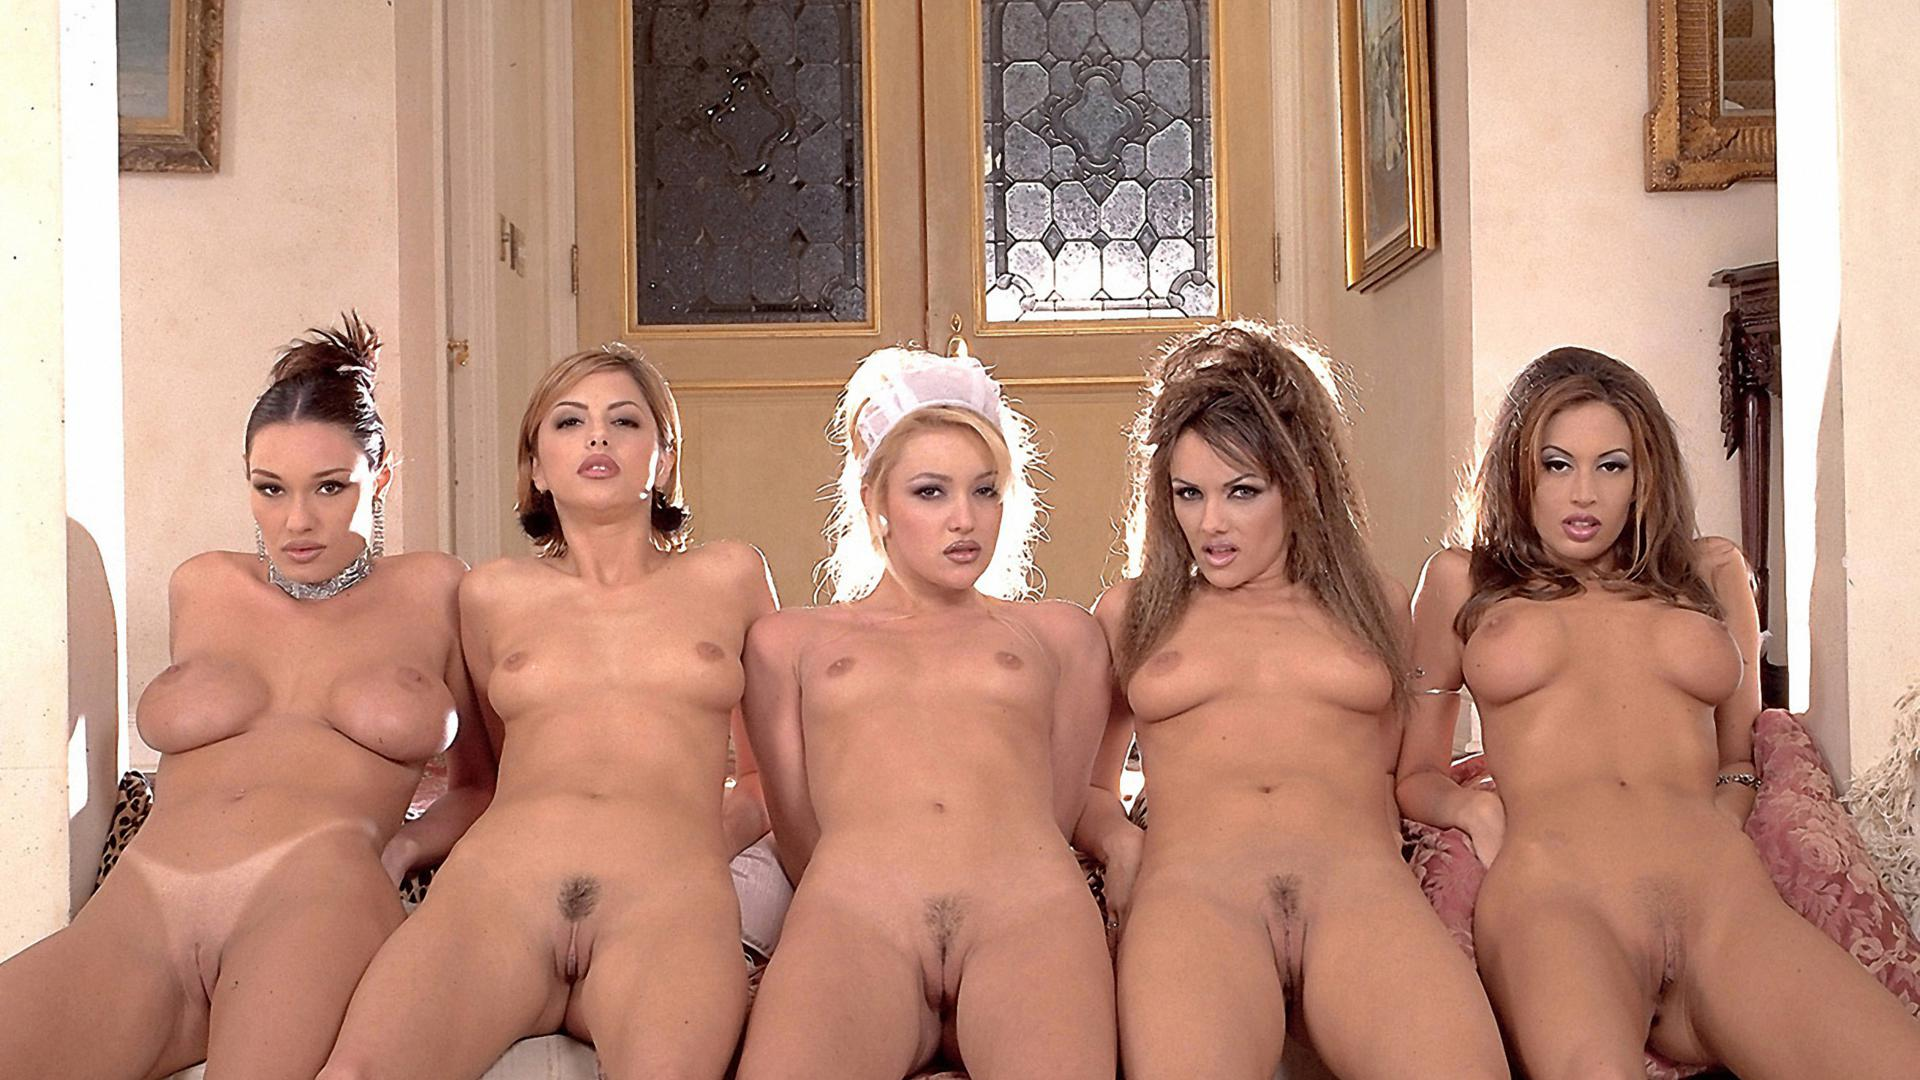 Sex nudies beautiful girl arabia-4460